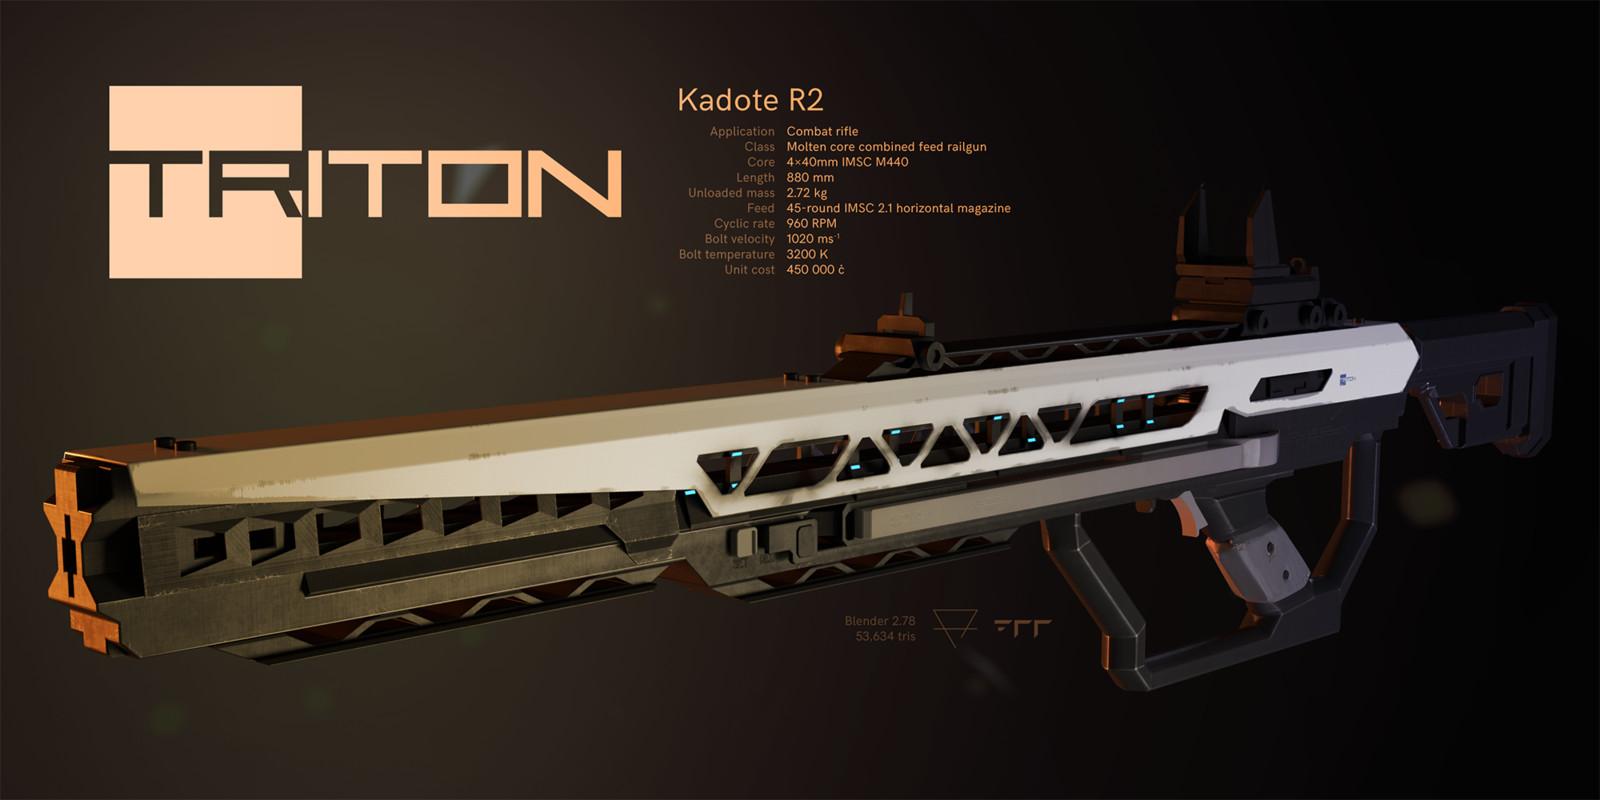 Triton Kadote R2 combat rifle, final render. February 2017